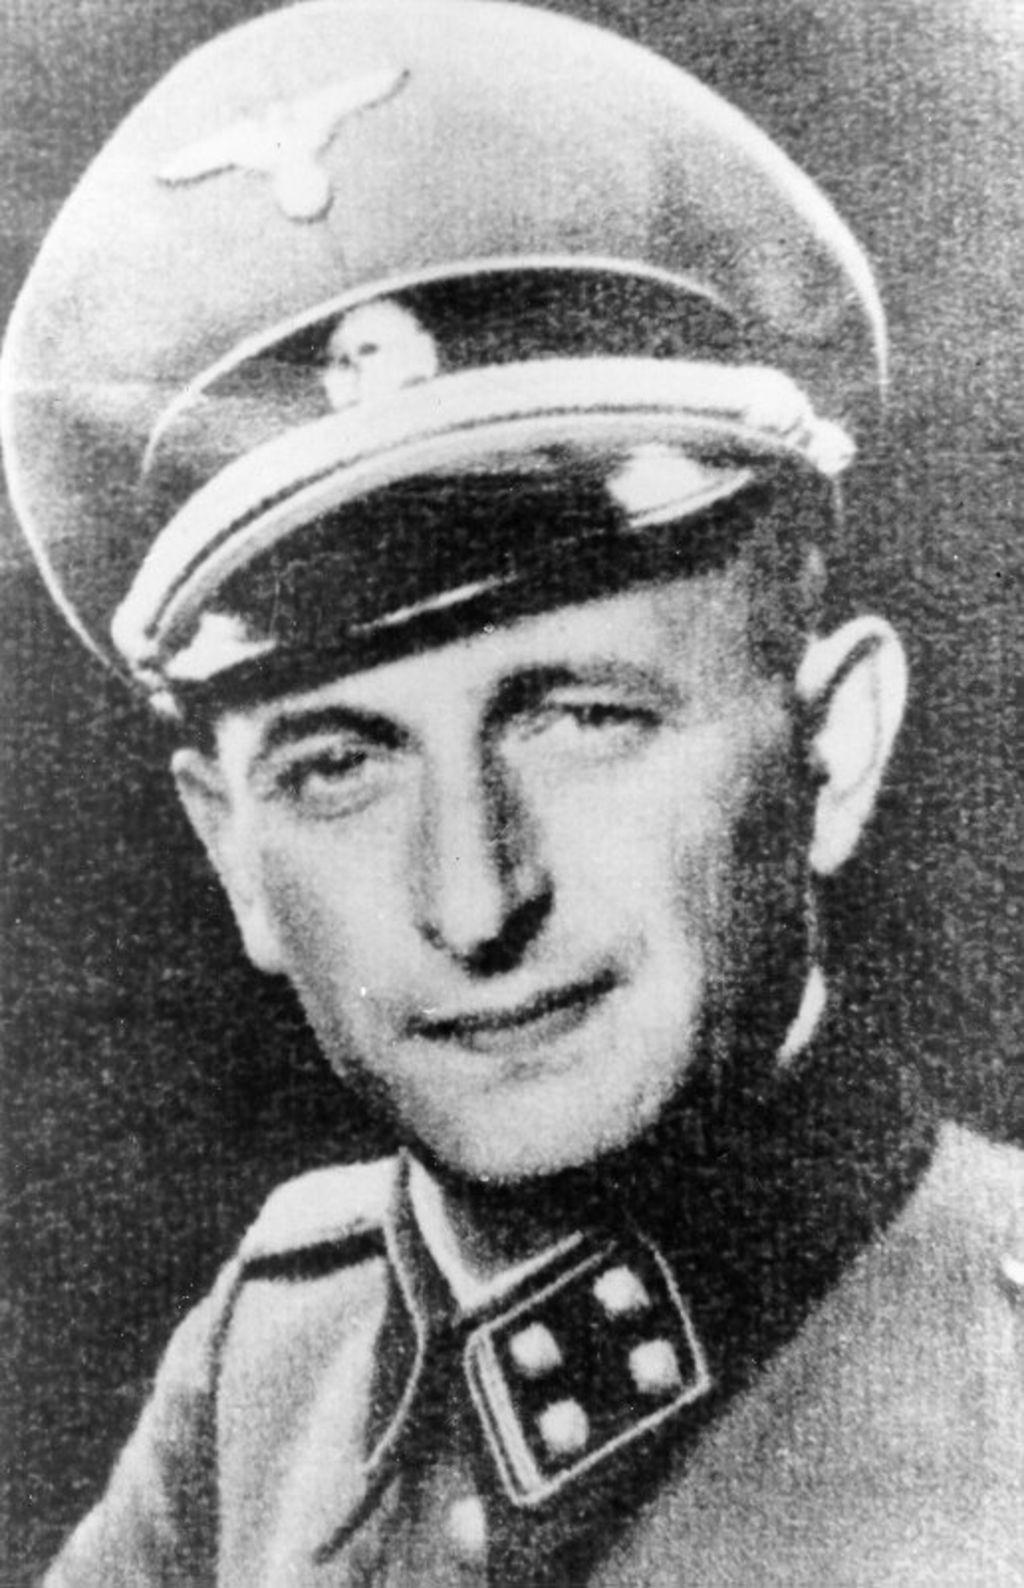 LeMO Biografie Biografie Adolf Eichmann